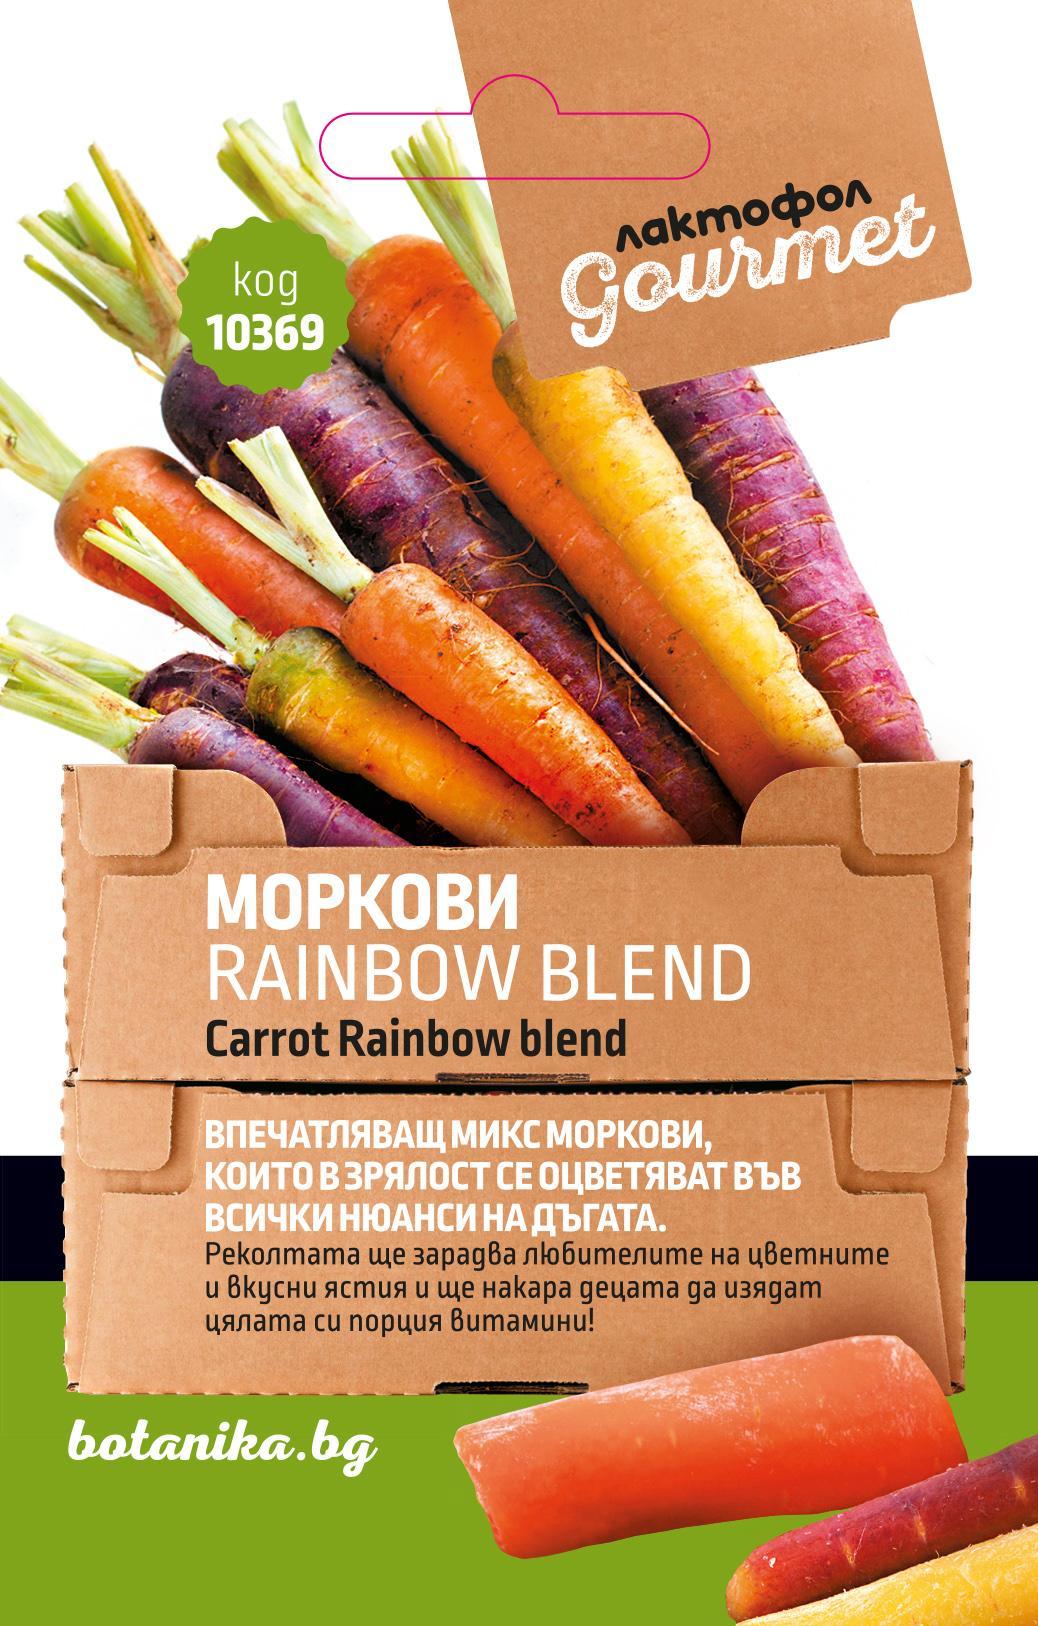 Моркови Rainbow Blend